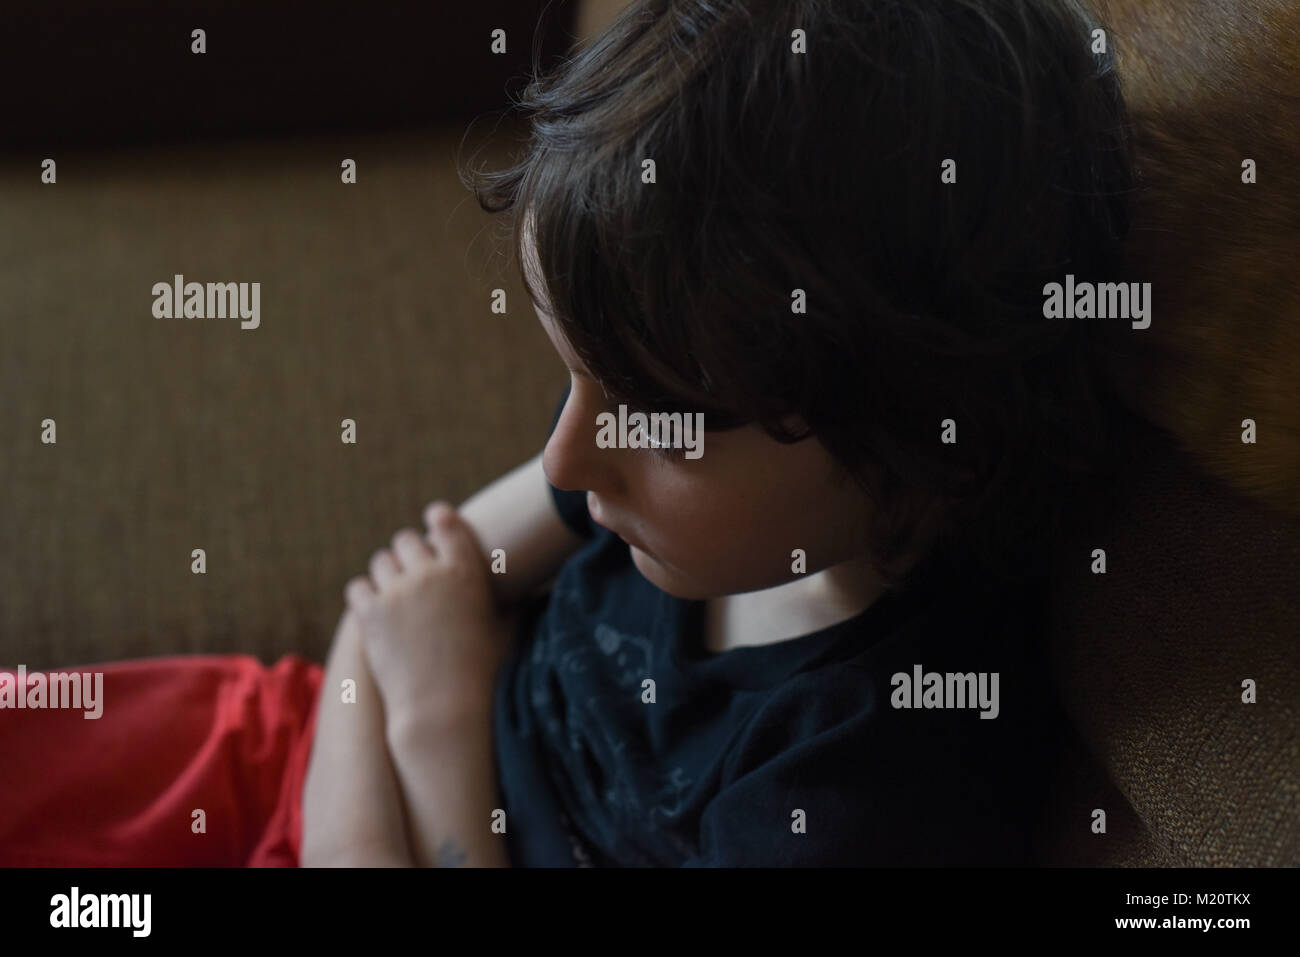 Sad child - Stock Image